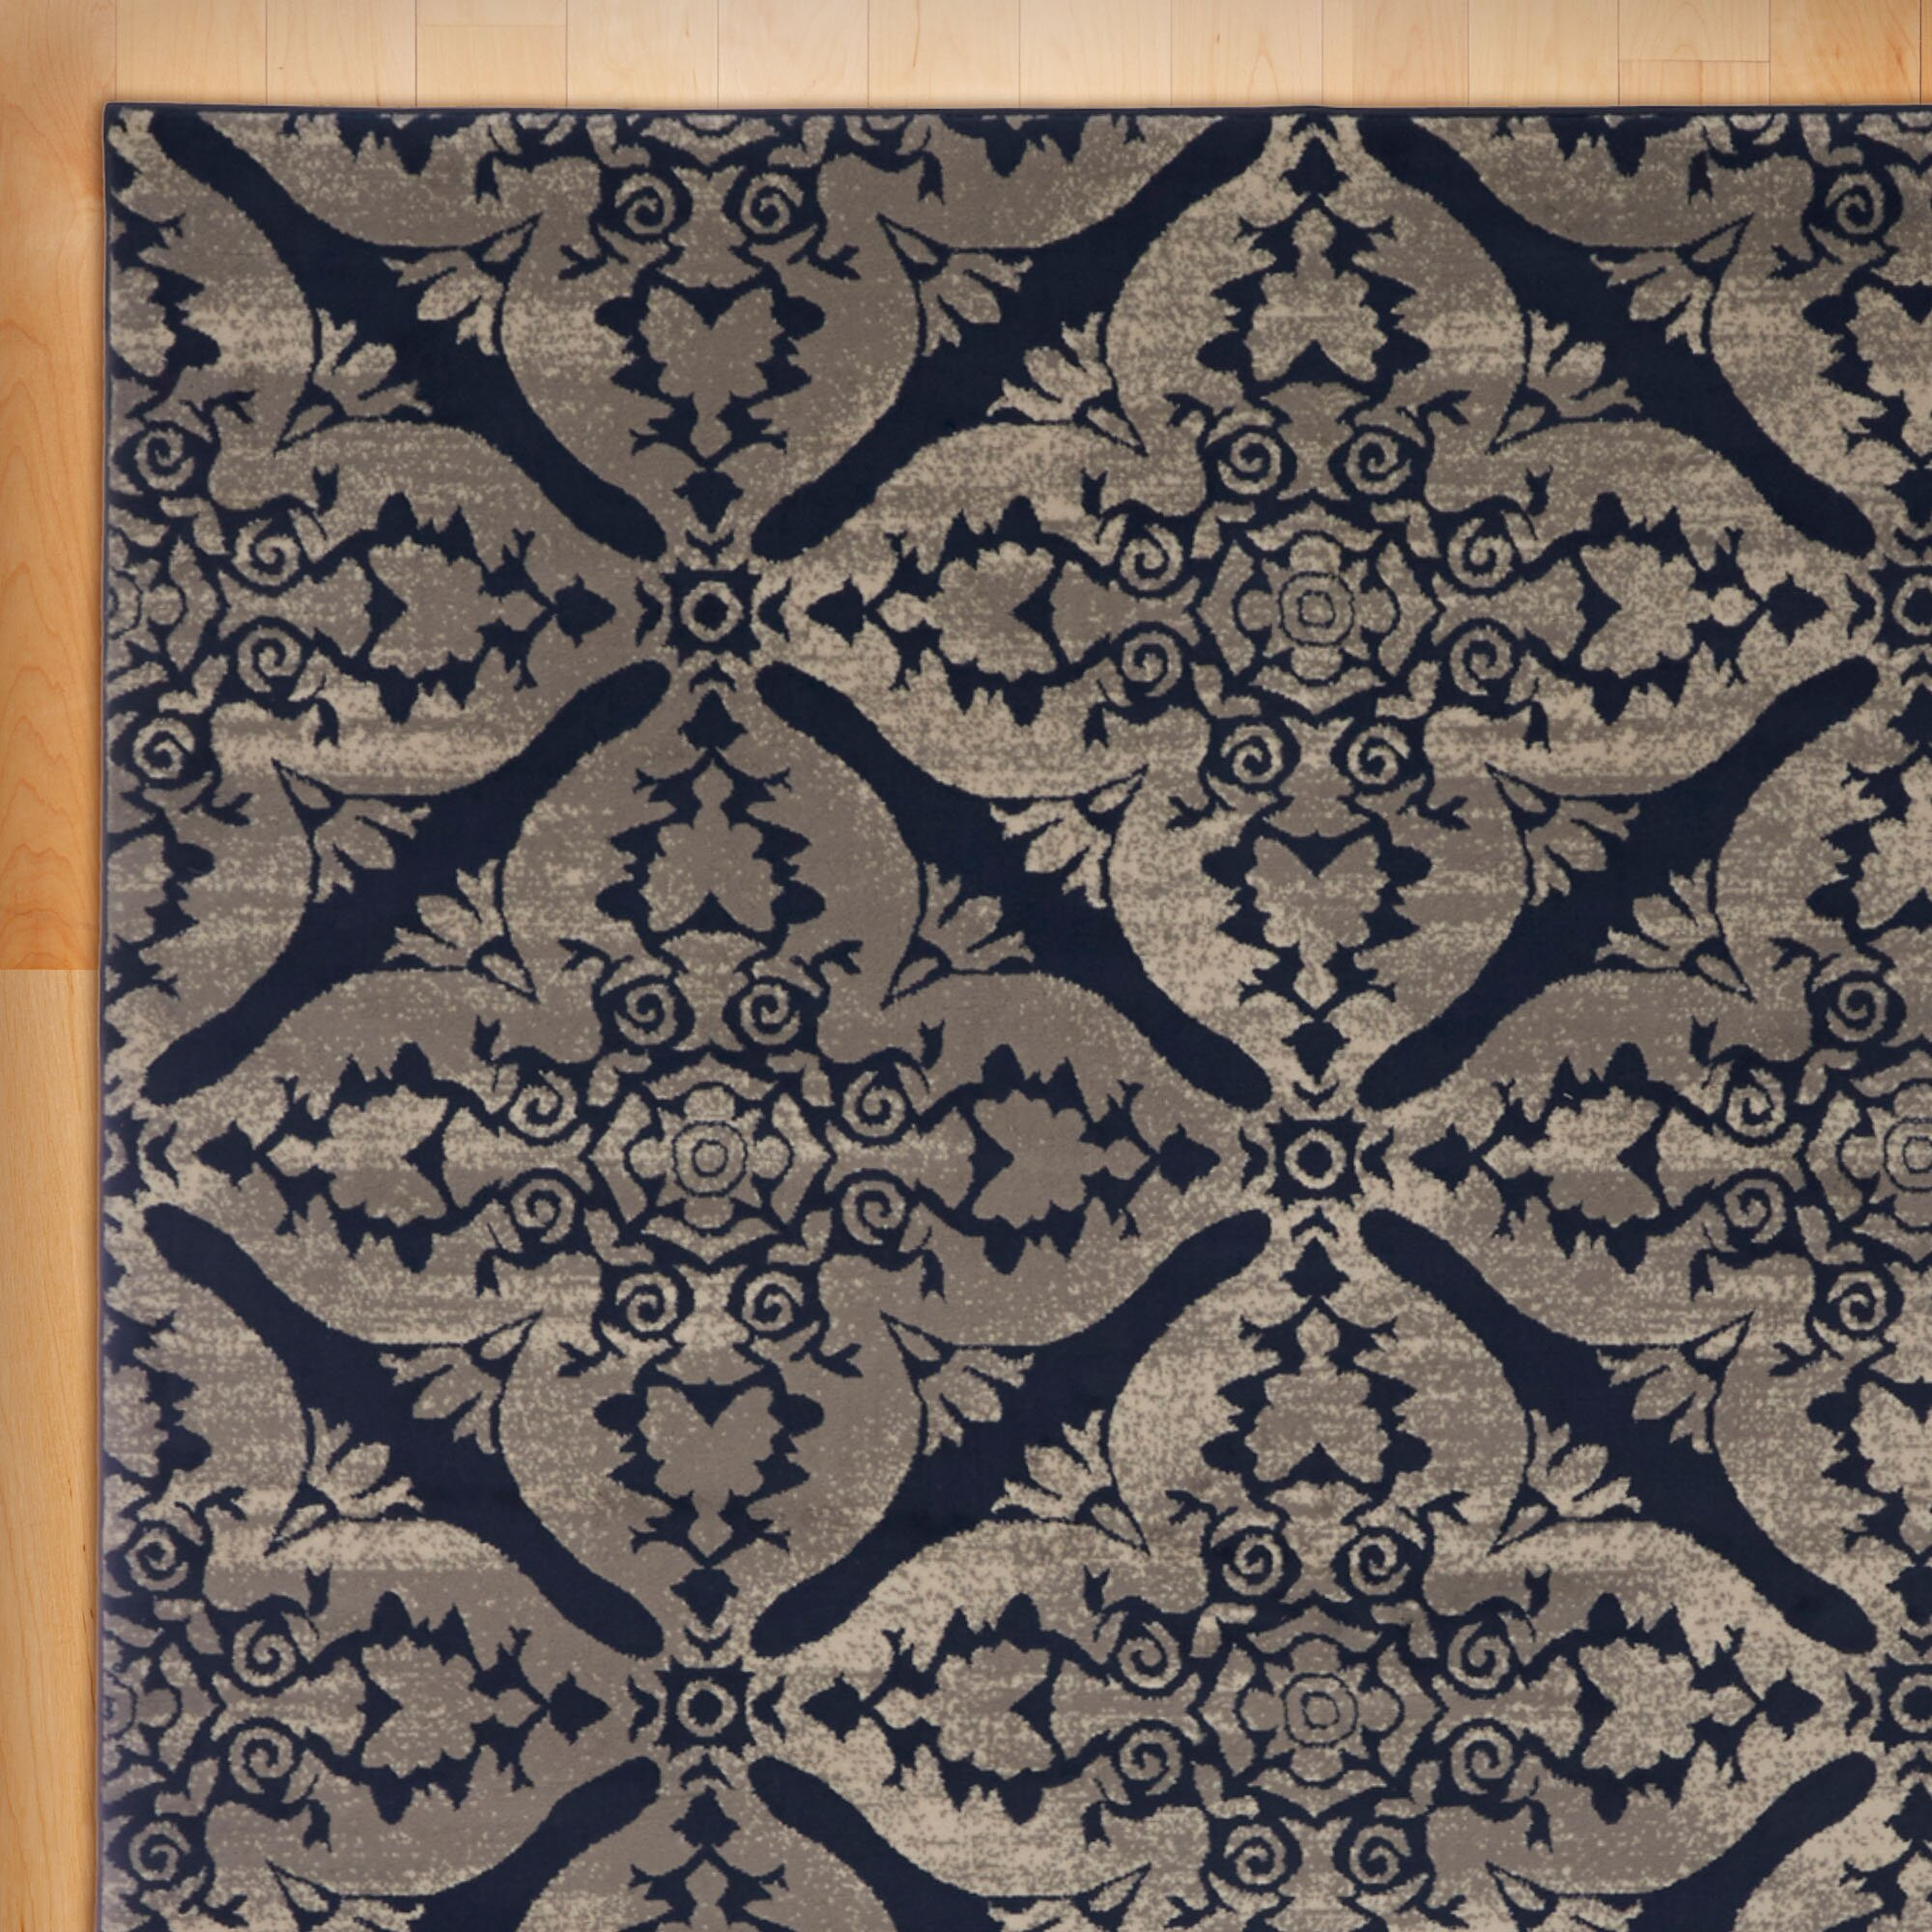 andover mills blue gray area rug reviews wayfair. Black Bedroom Furniture Sets. Home Design Ideas